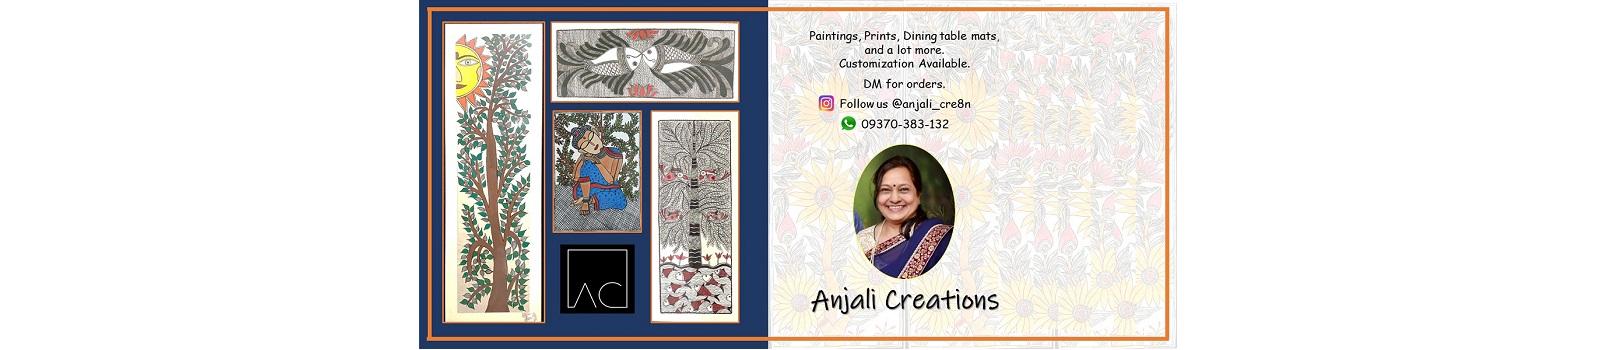 Anjali Creations